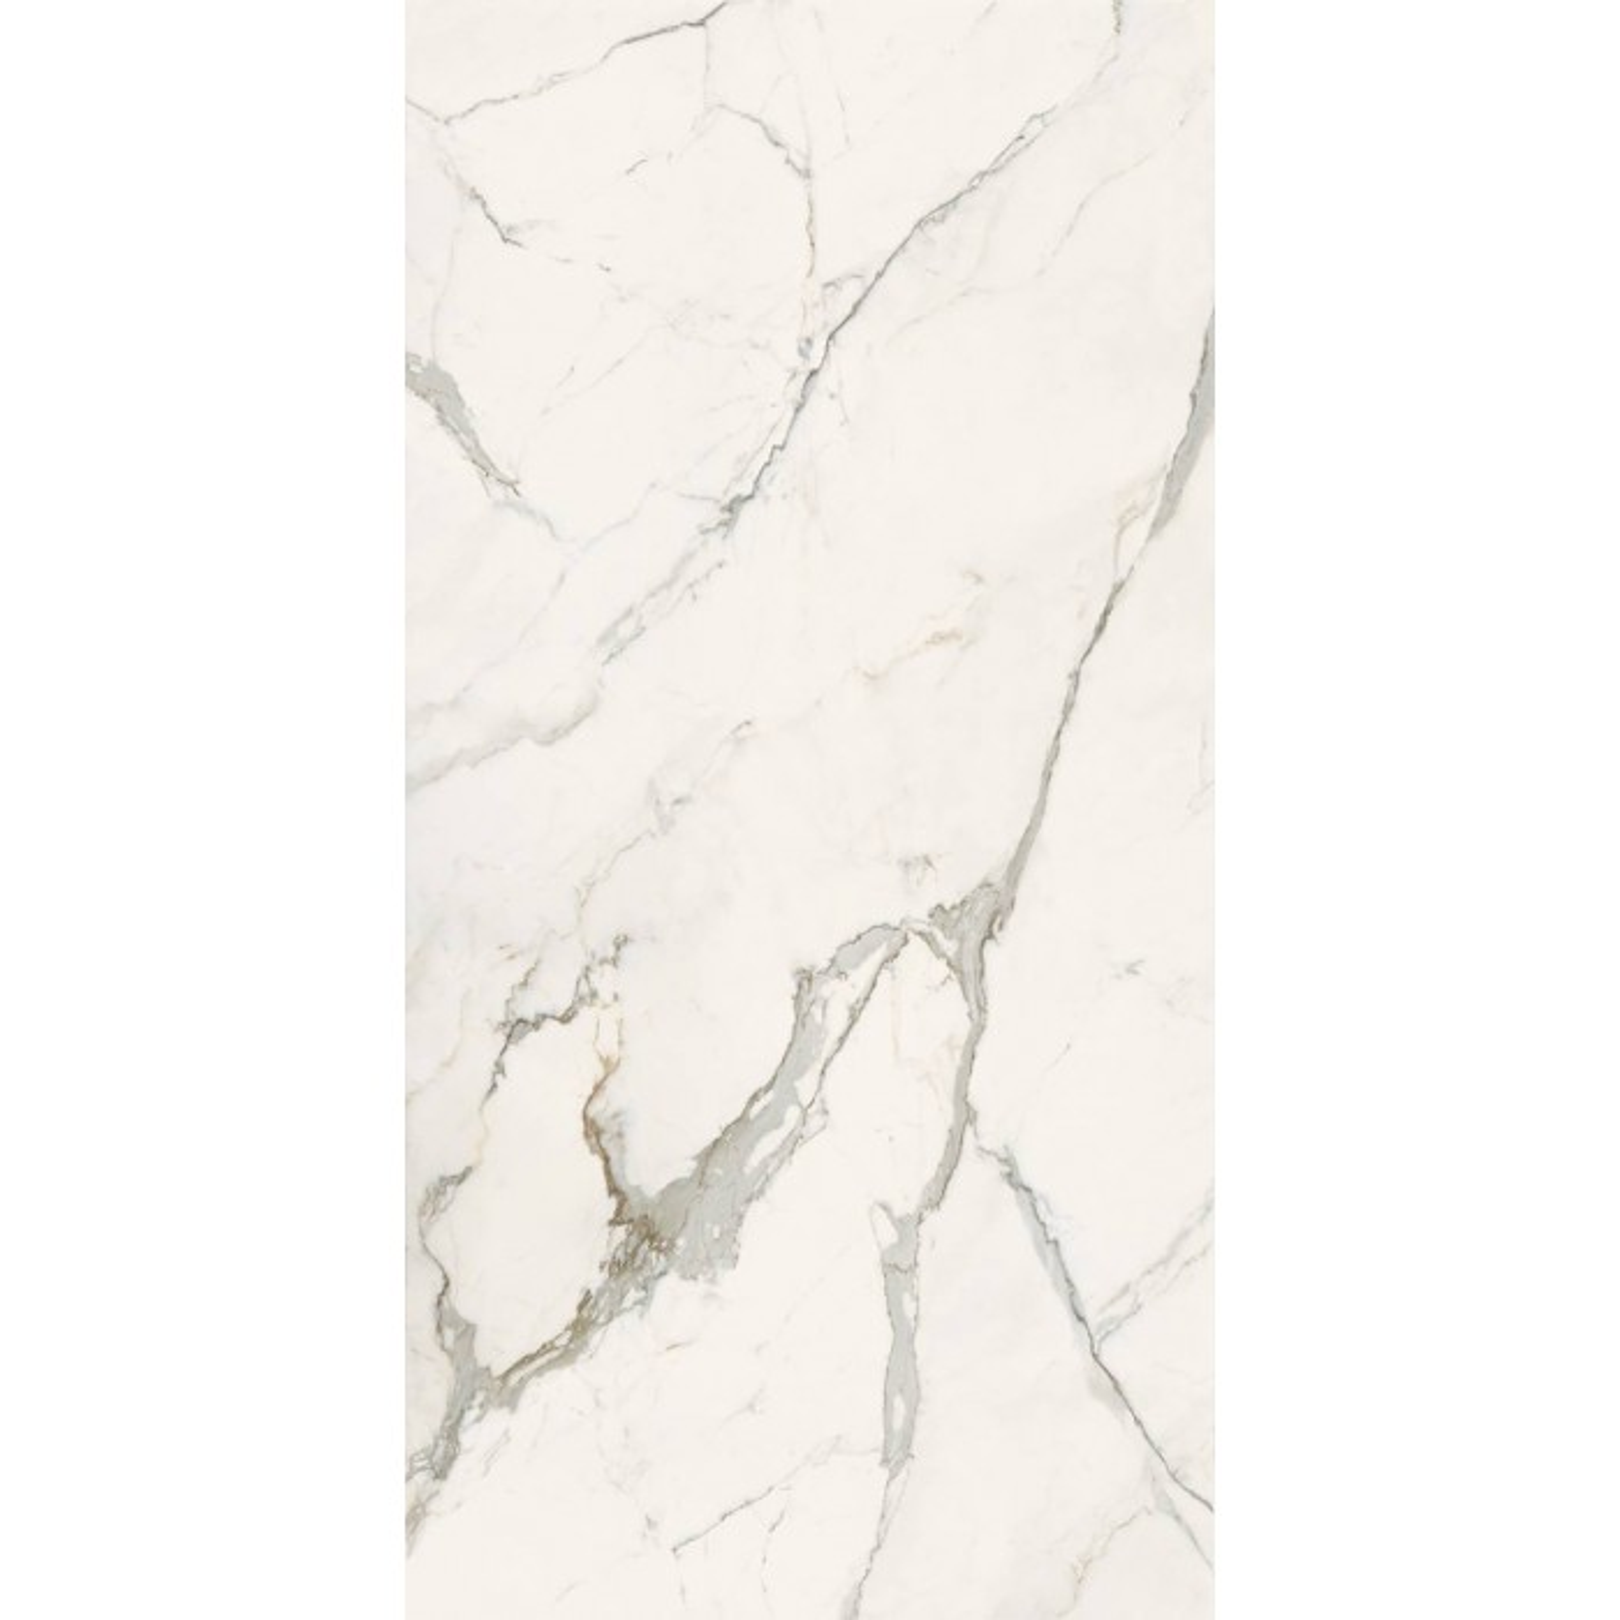 Carrelage grès cérame effet marbre Infinito 2.0 Calacatta Light (4formats, 2 finitions)